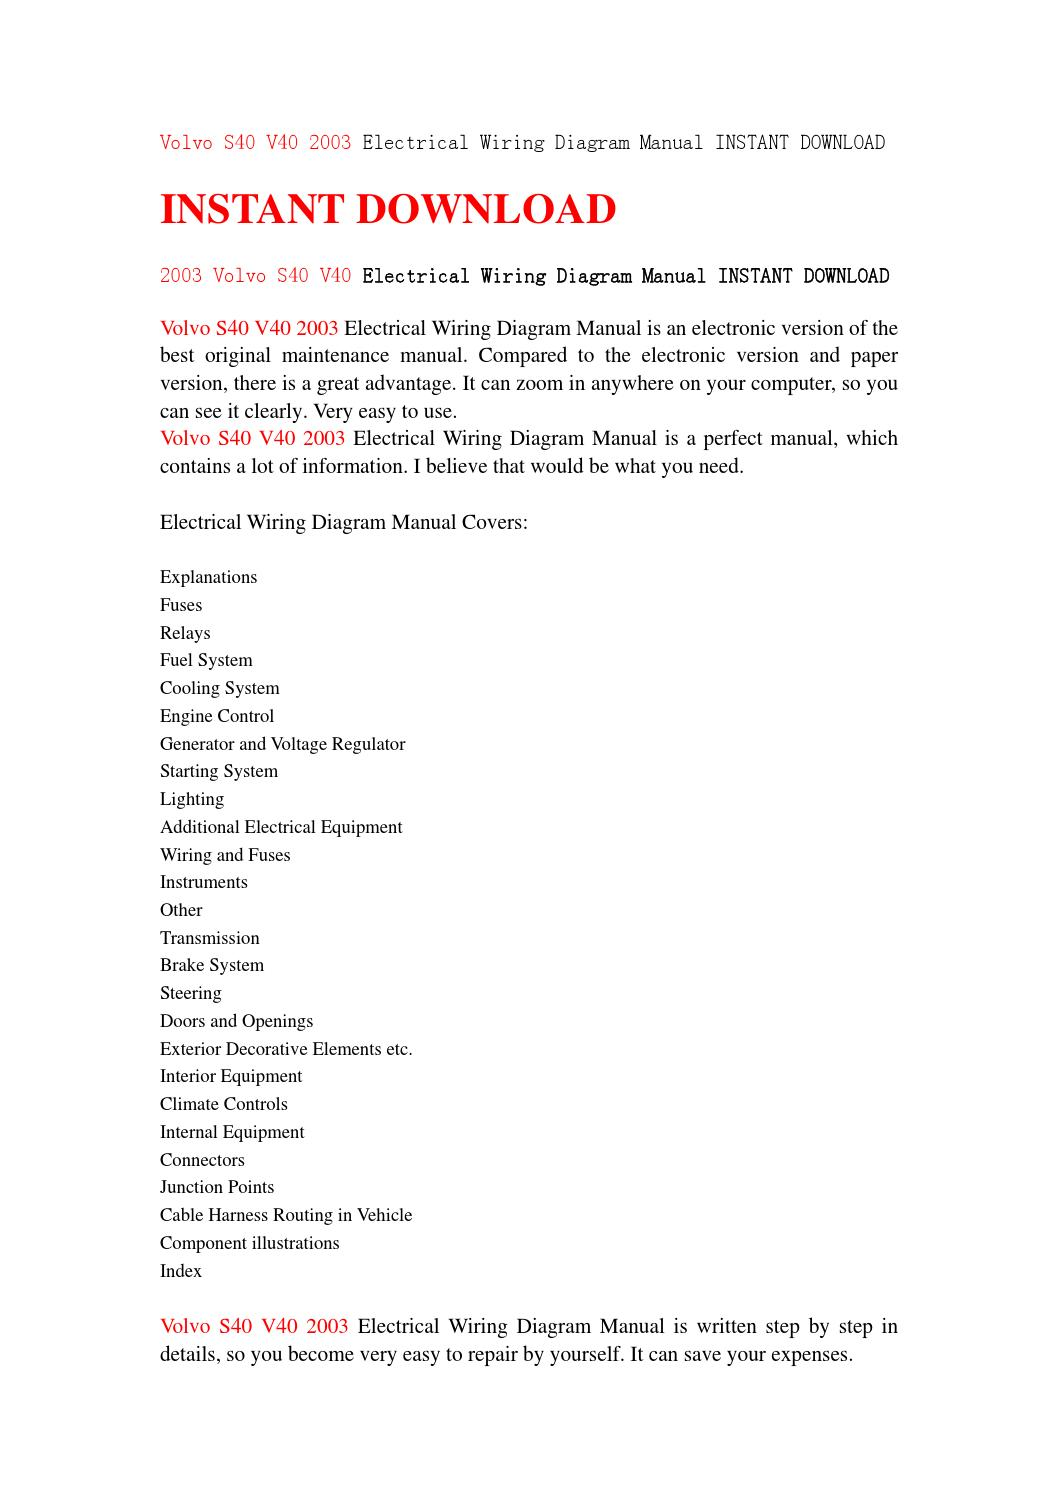 Volvo S40 V40 2003 Electrical Wiring Diagram Manual Insta